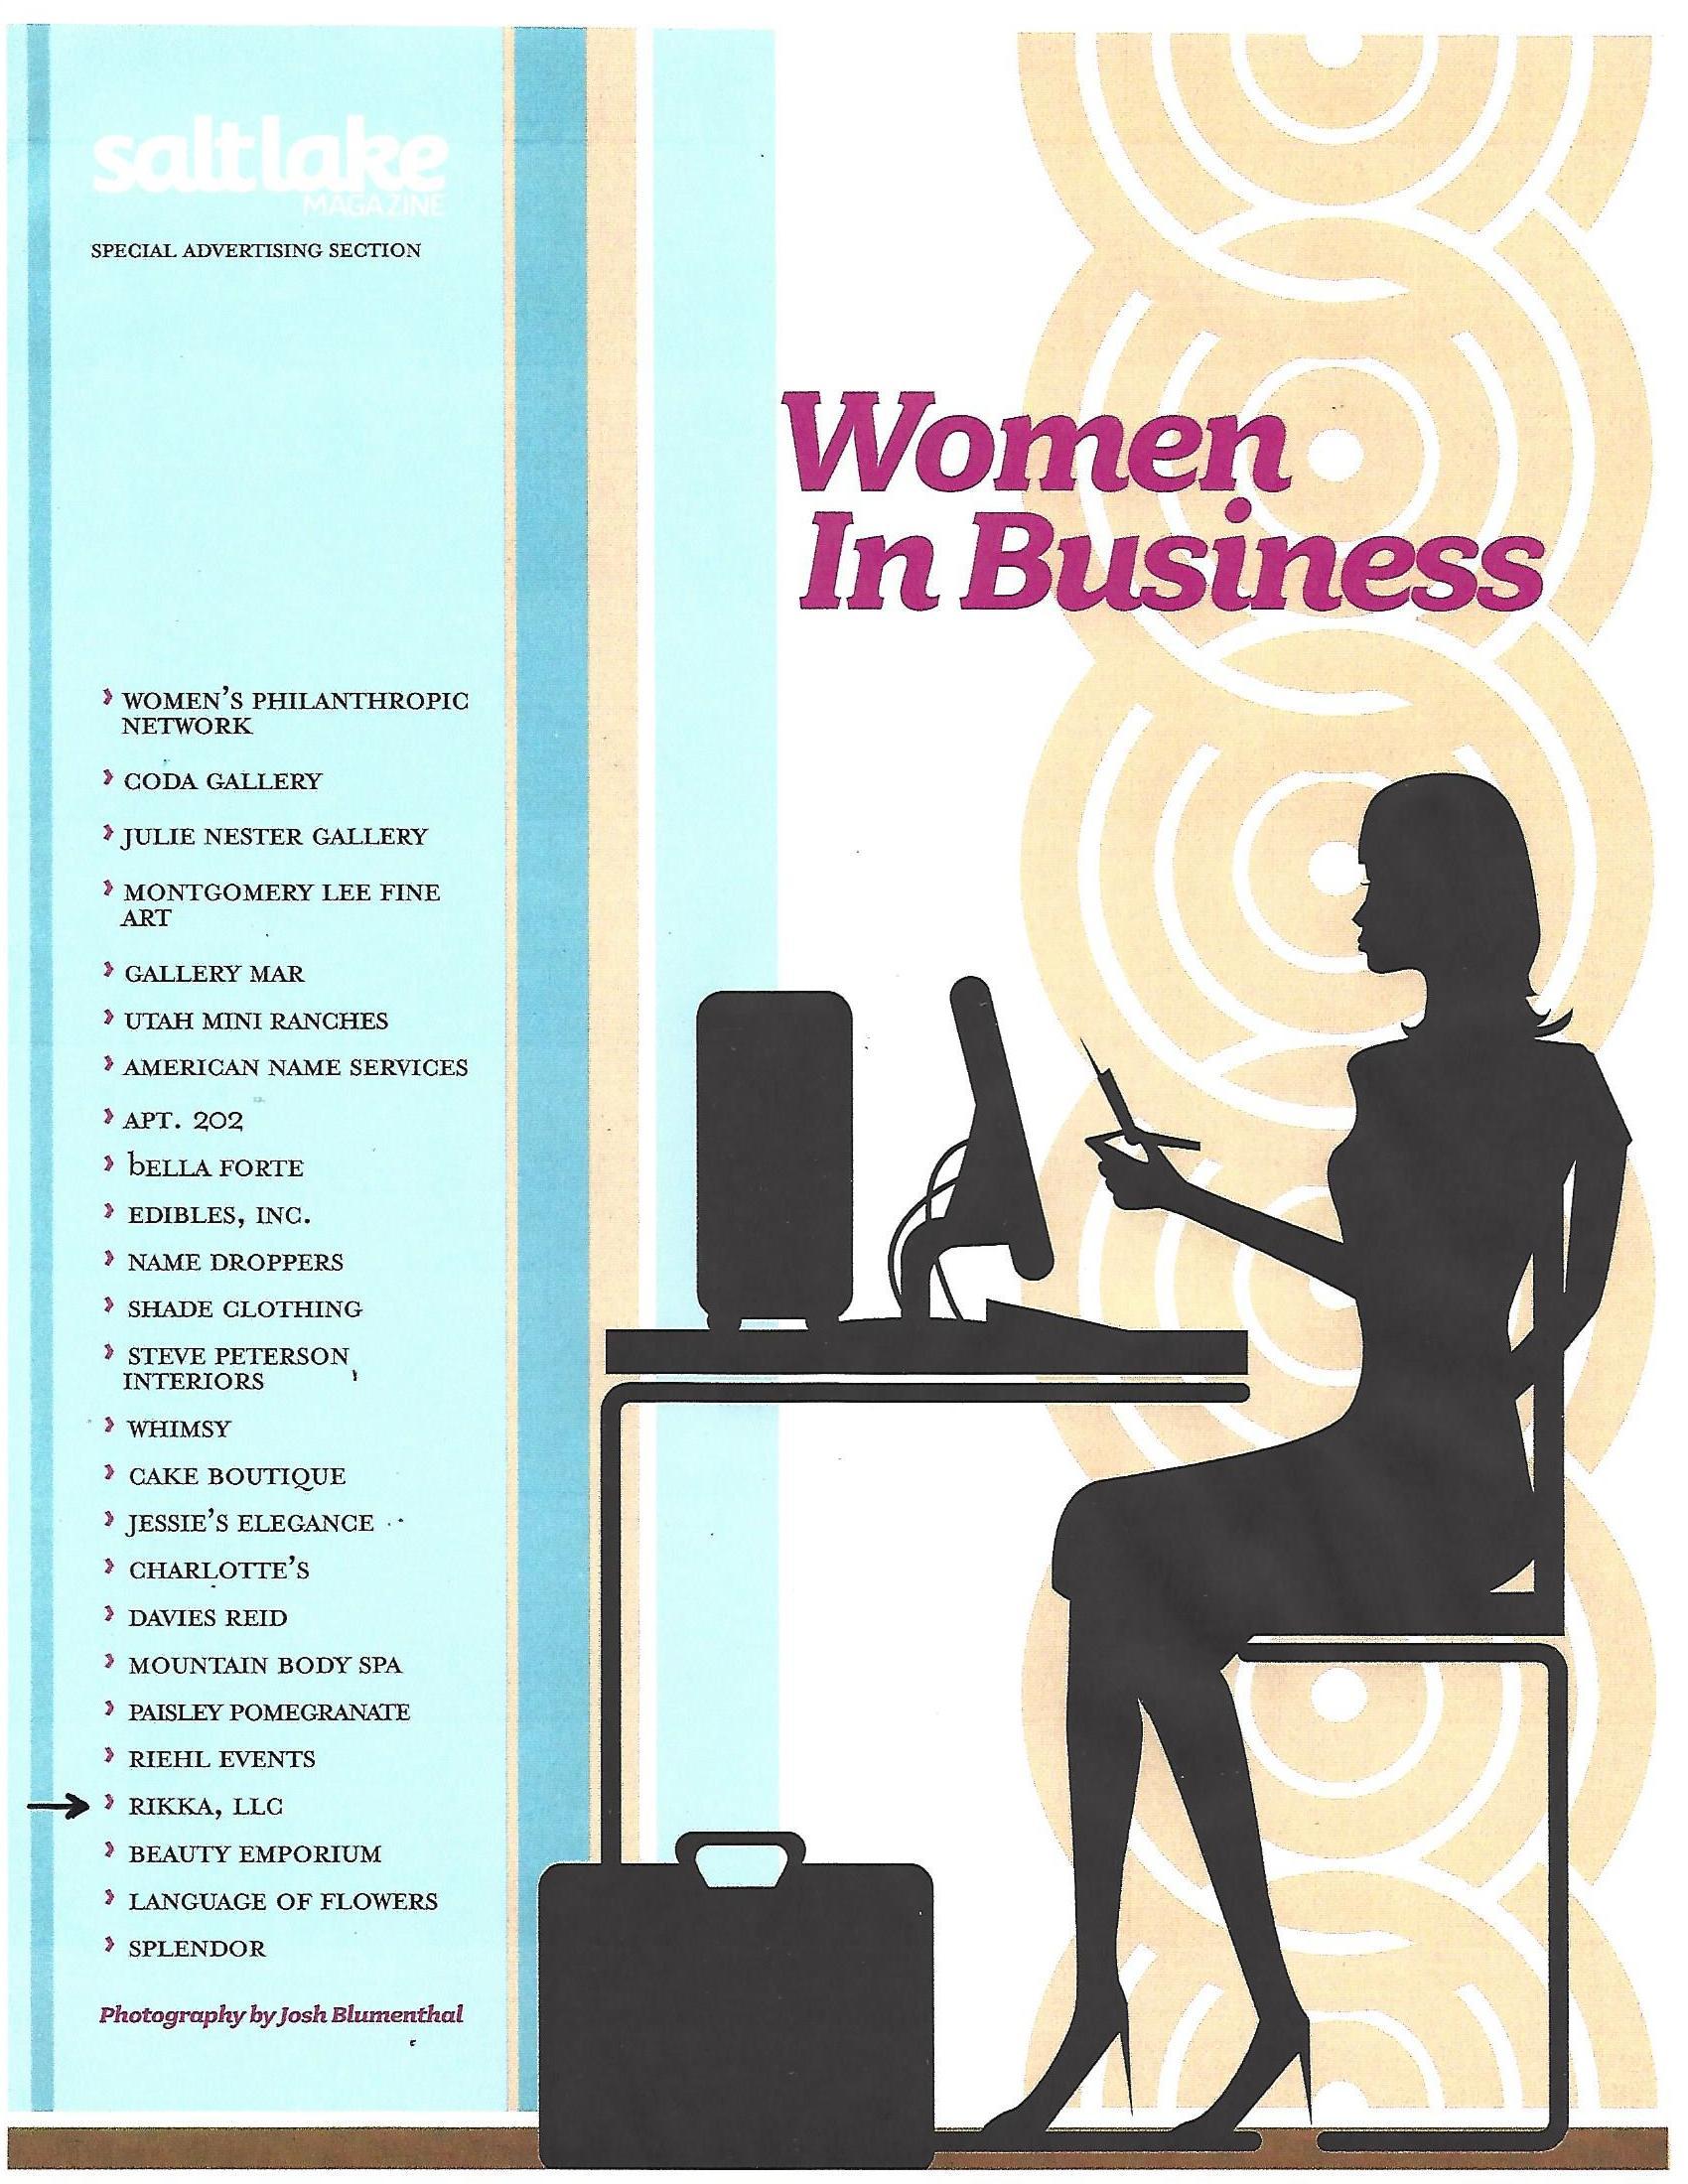 Women in Business (Salt Lake Magazine Oct. 2008) - Article on Rikka, LLC_Page_1.jpg